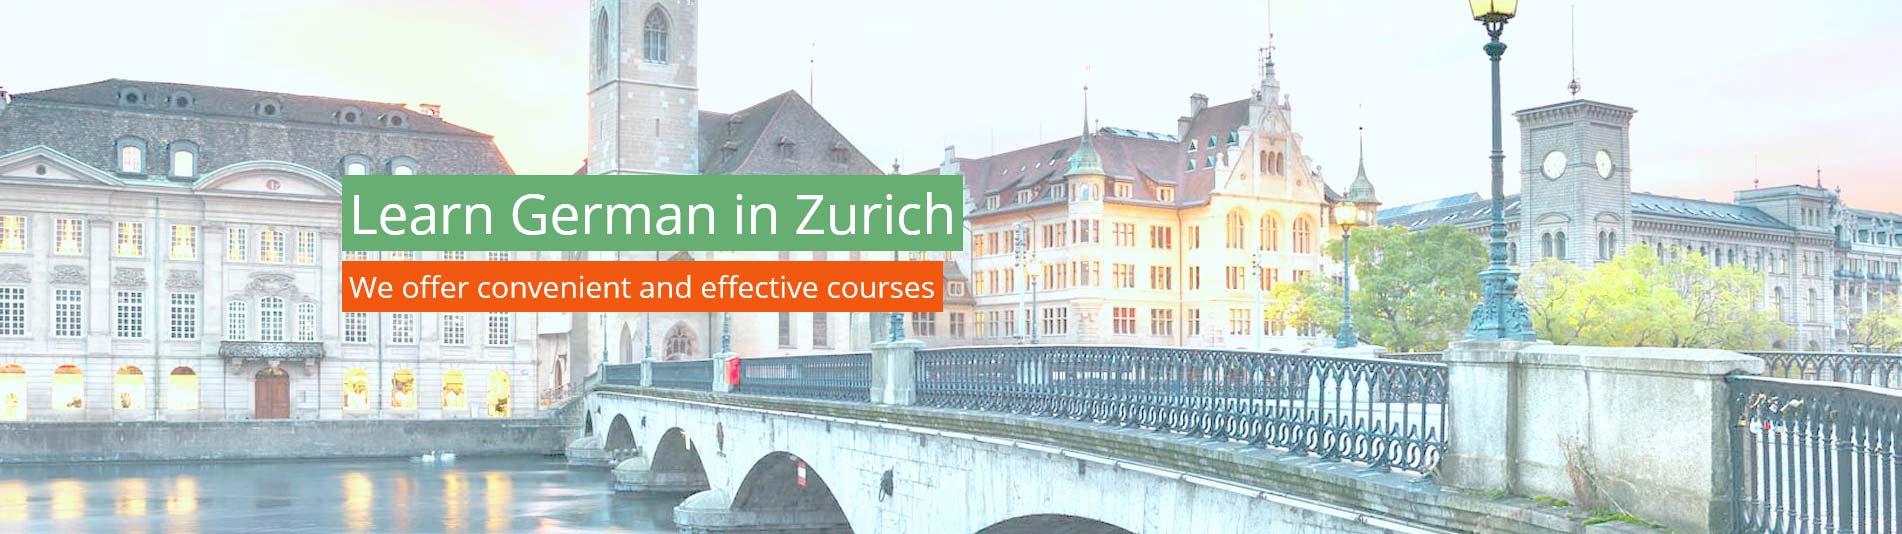 Learn German in Zurich - Studying German in Switzerland